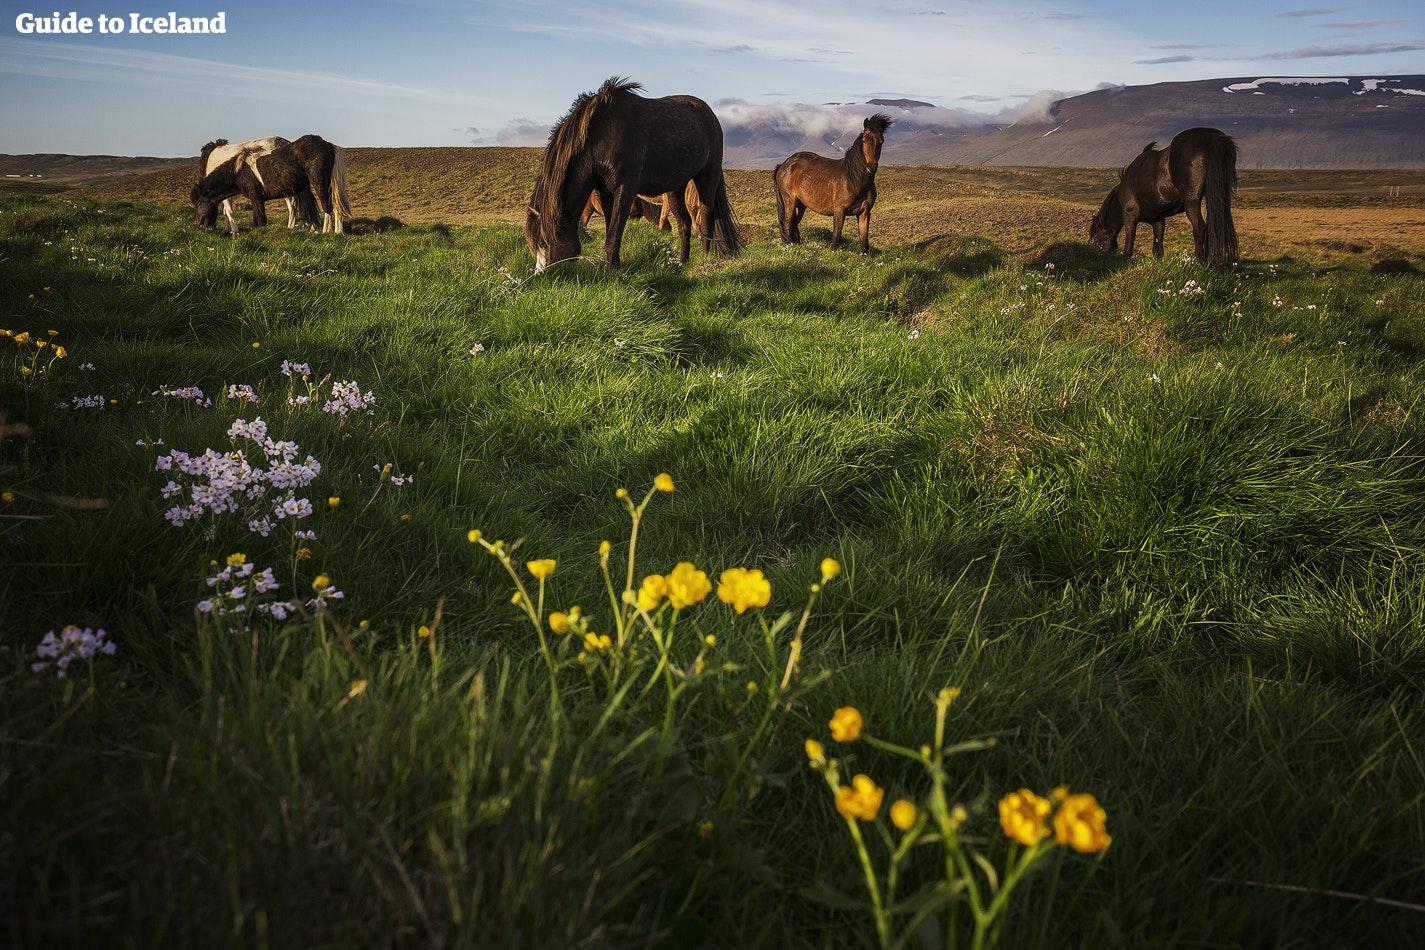 Combine your Golden Circle tour with horseback riding